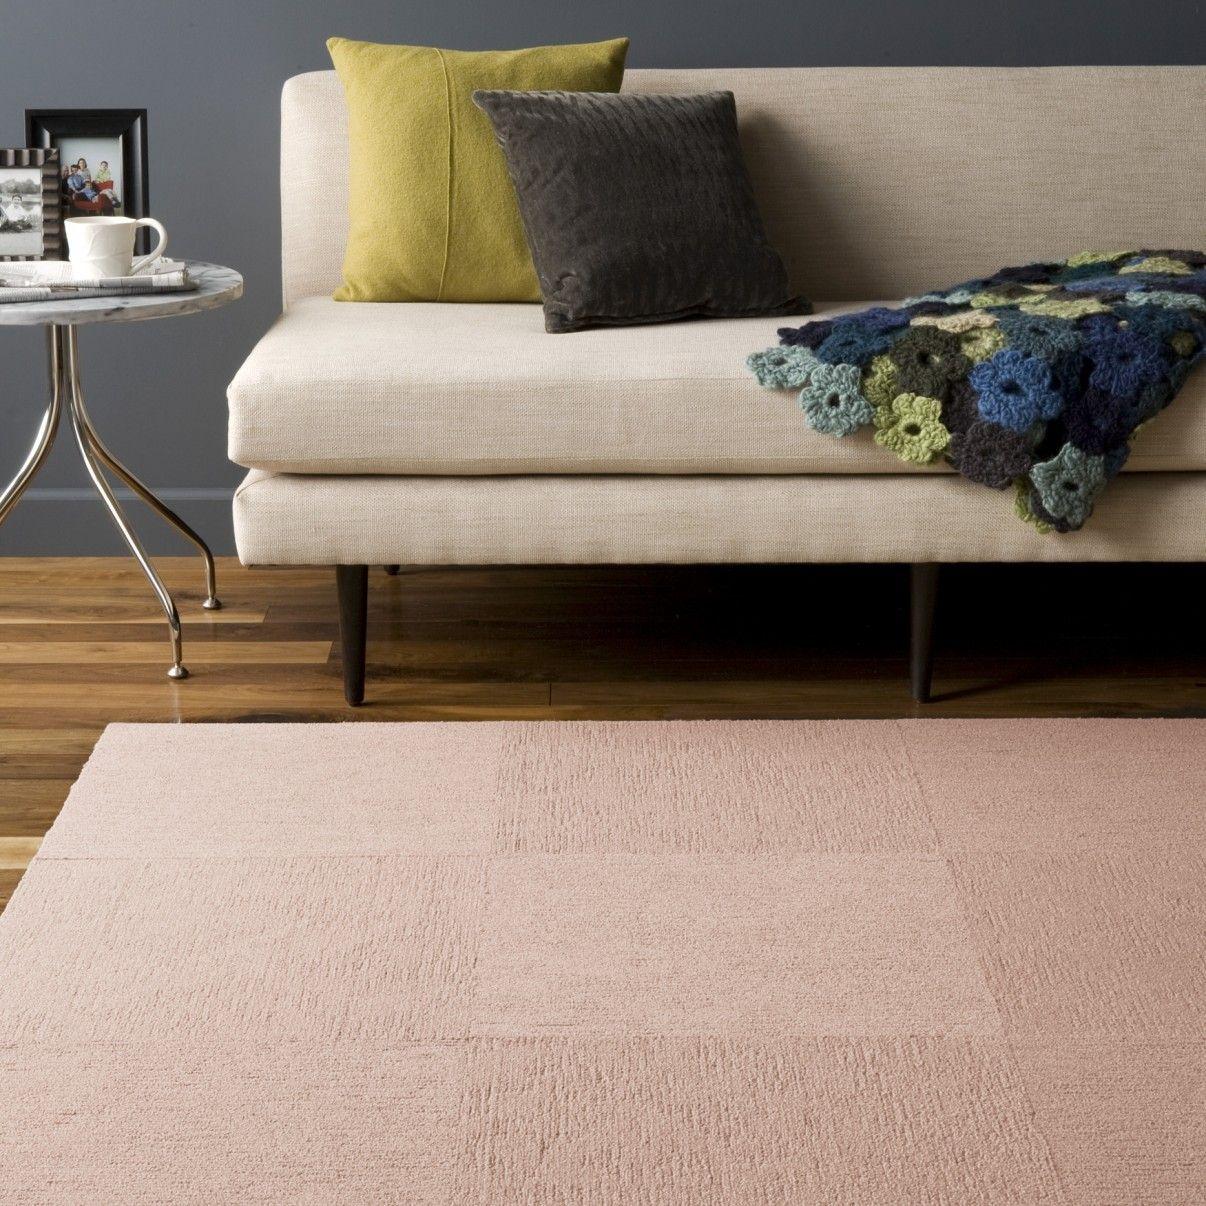 Buy Solid Feelin Groovy Blush Carpet Tile At Flor Carpet Tiles Yellow Carpet Feelin Groovy